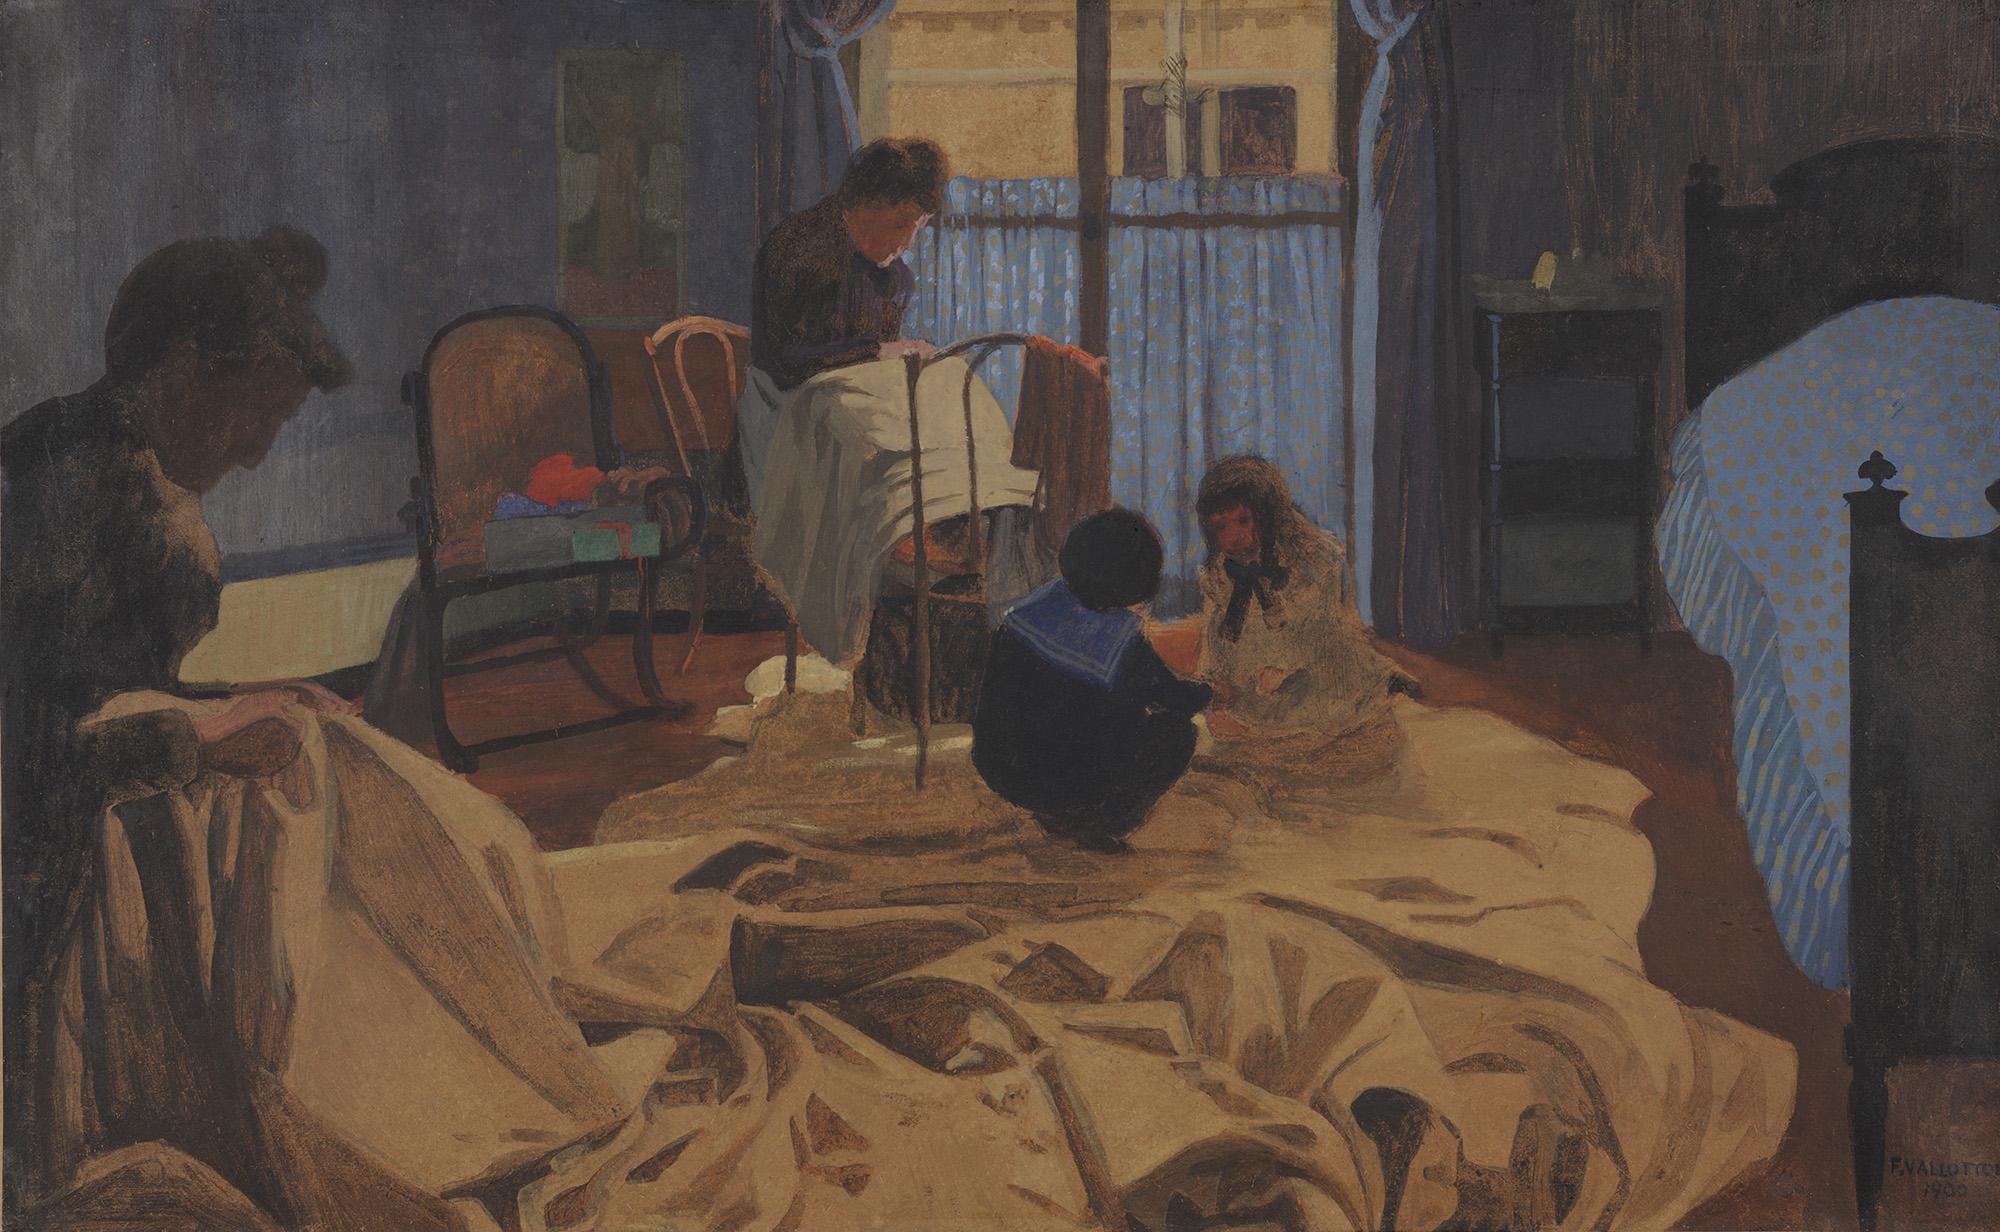 File:Felix Vallotton - The Laundress, Blue Room.jpg - Wikimedia Commons